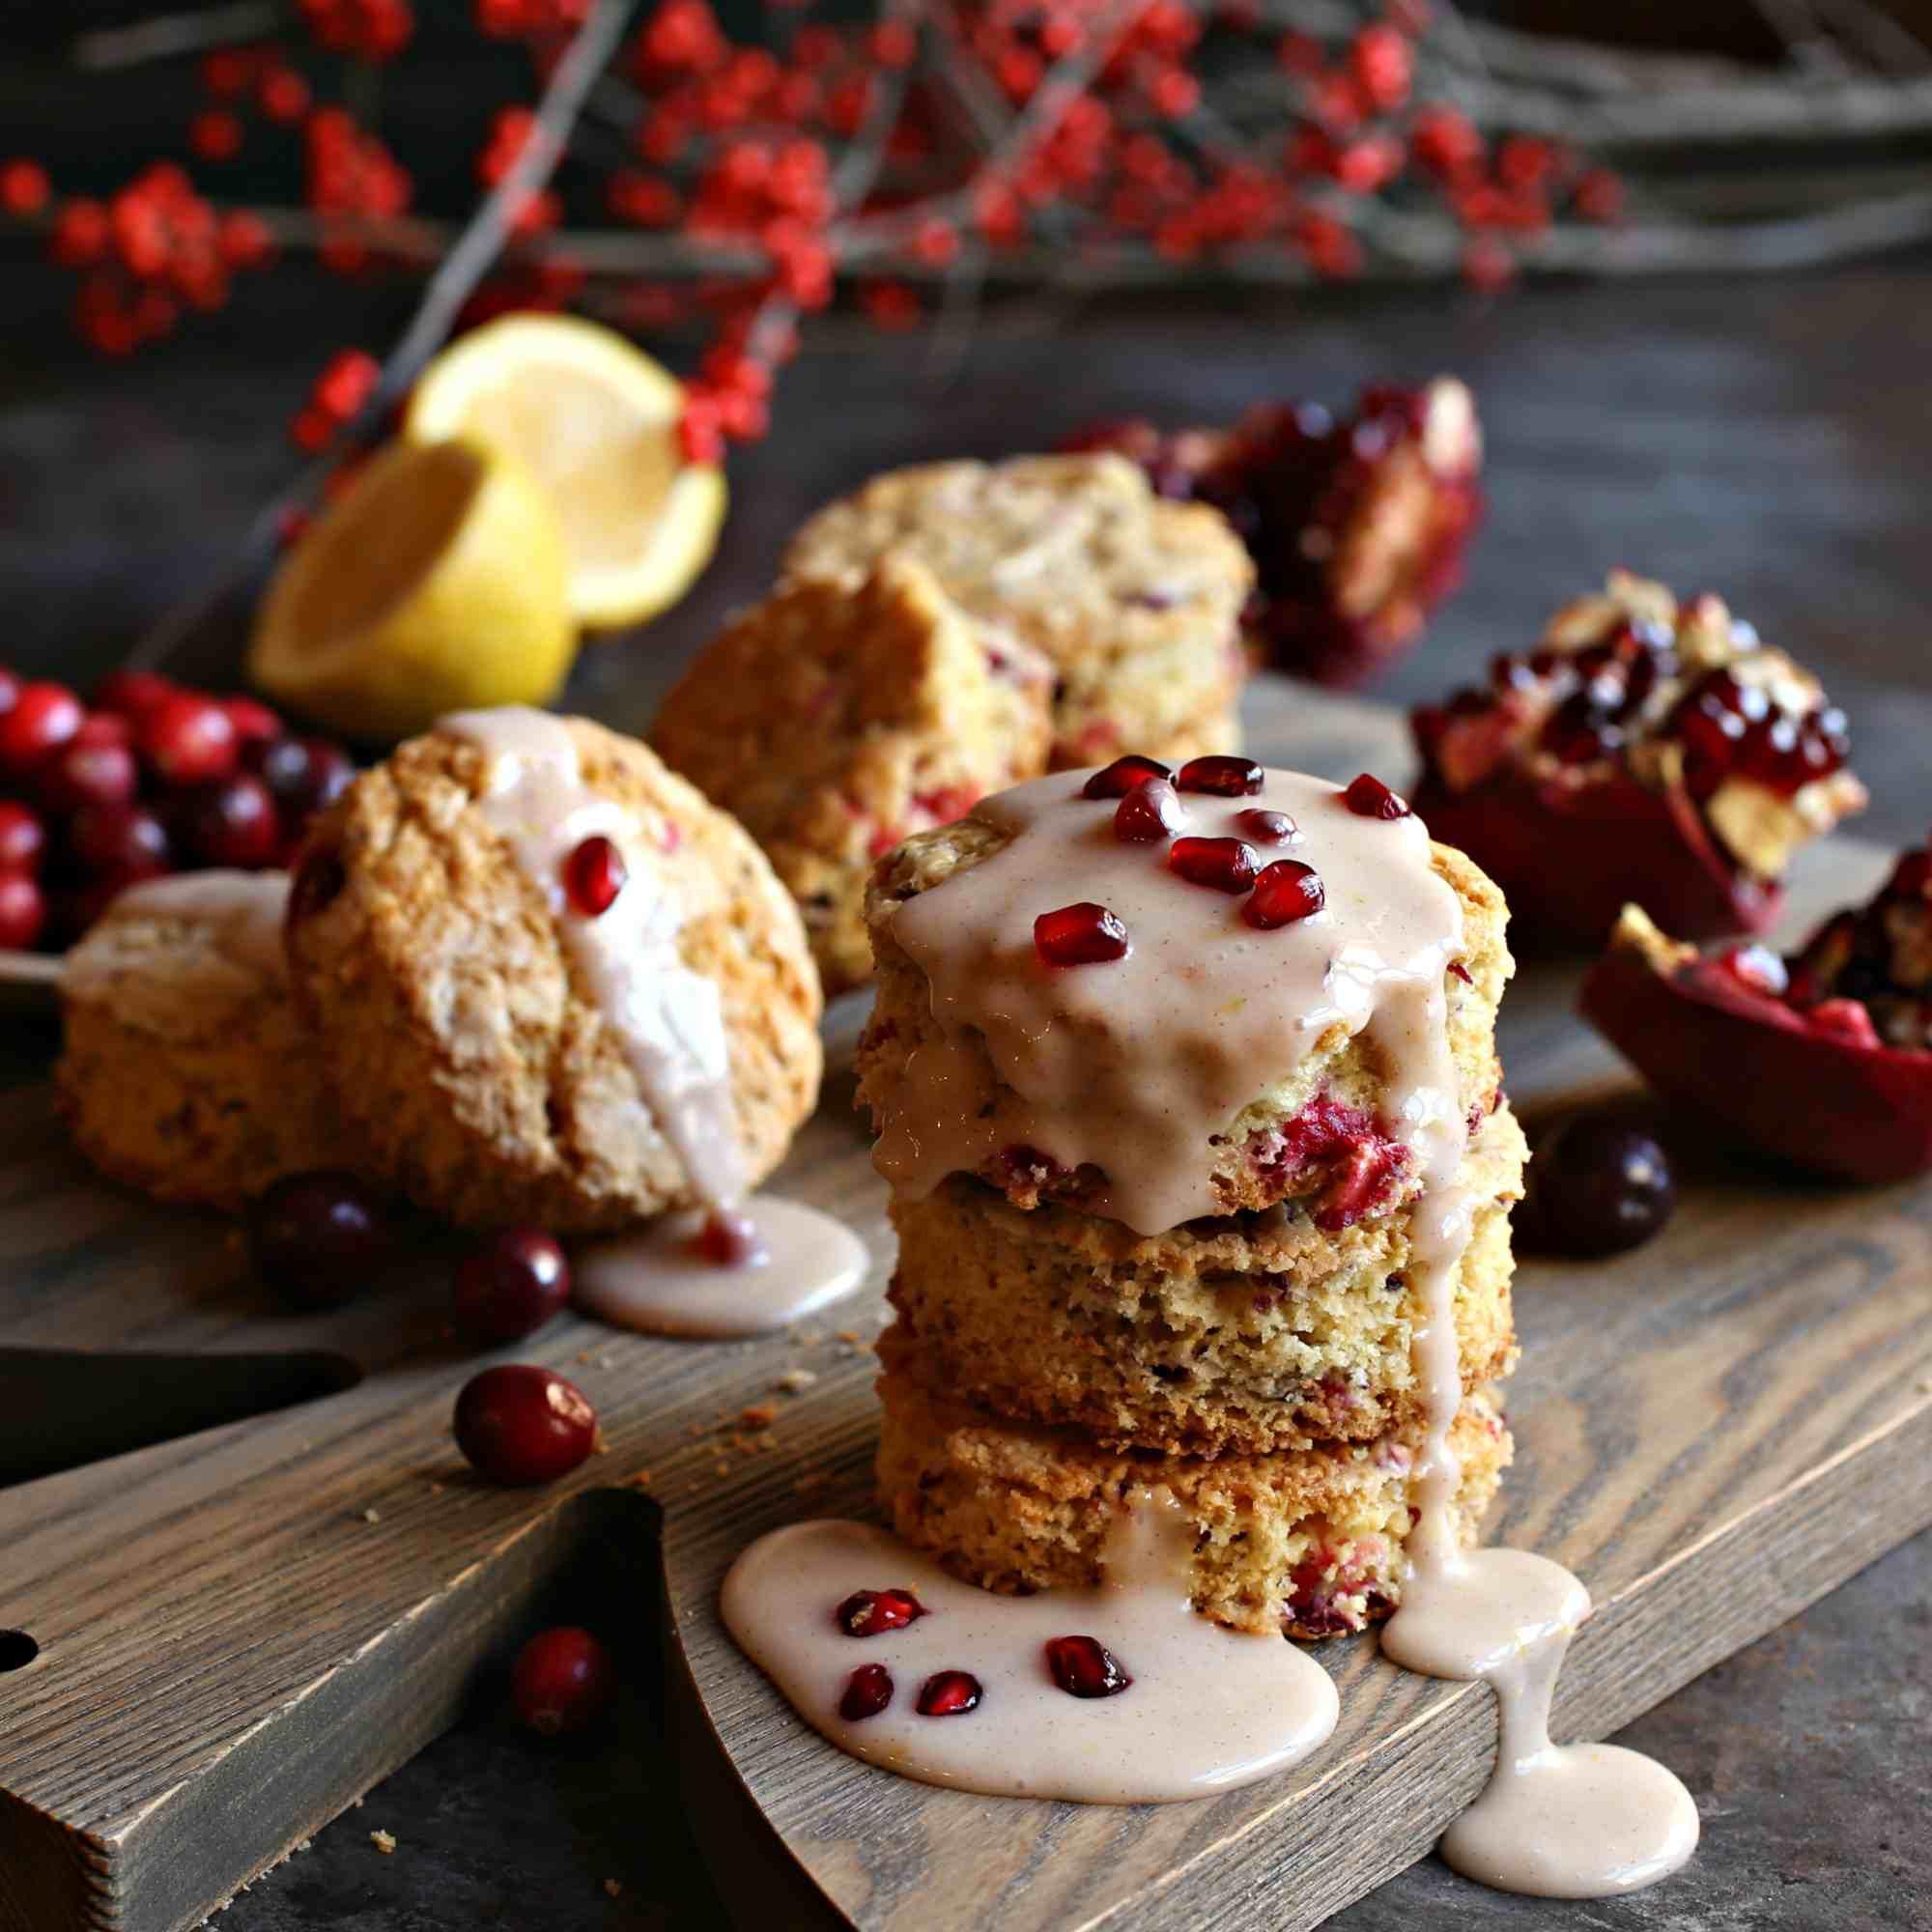 Cranberry Scones with Pomegranate Glaze